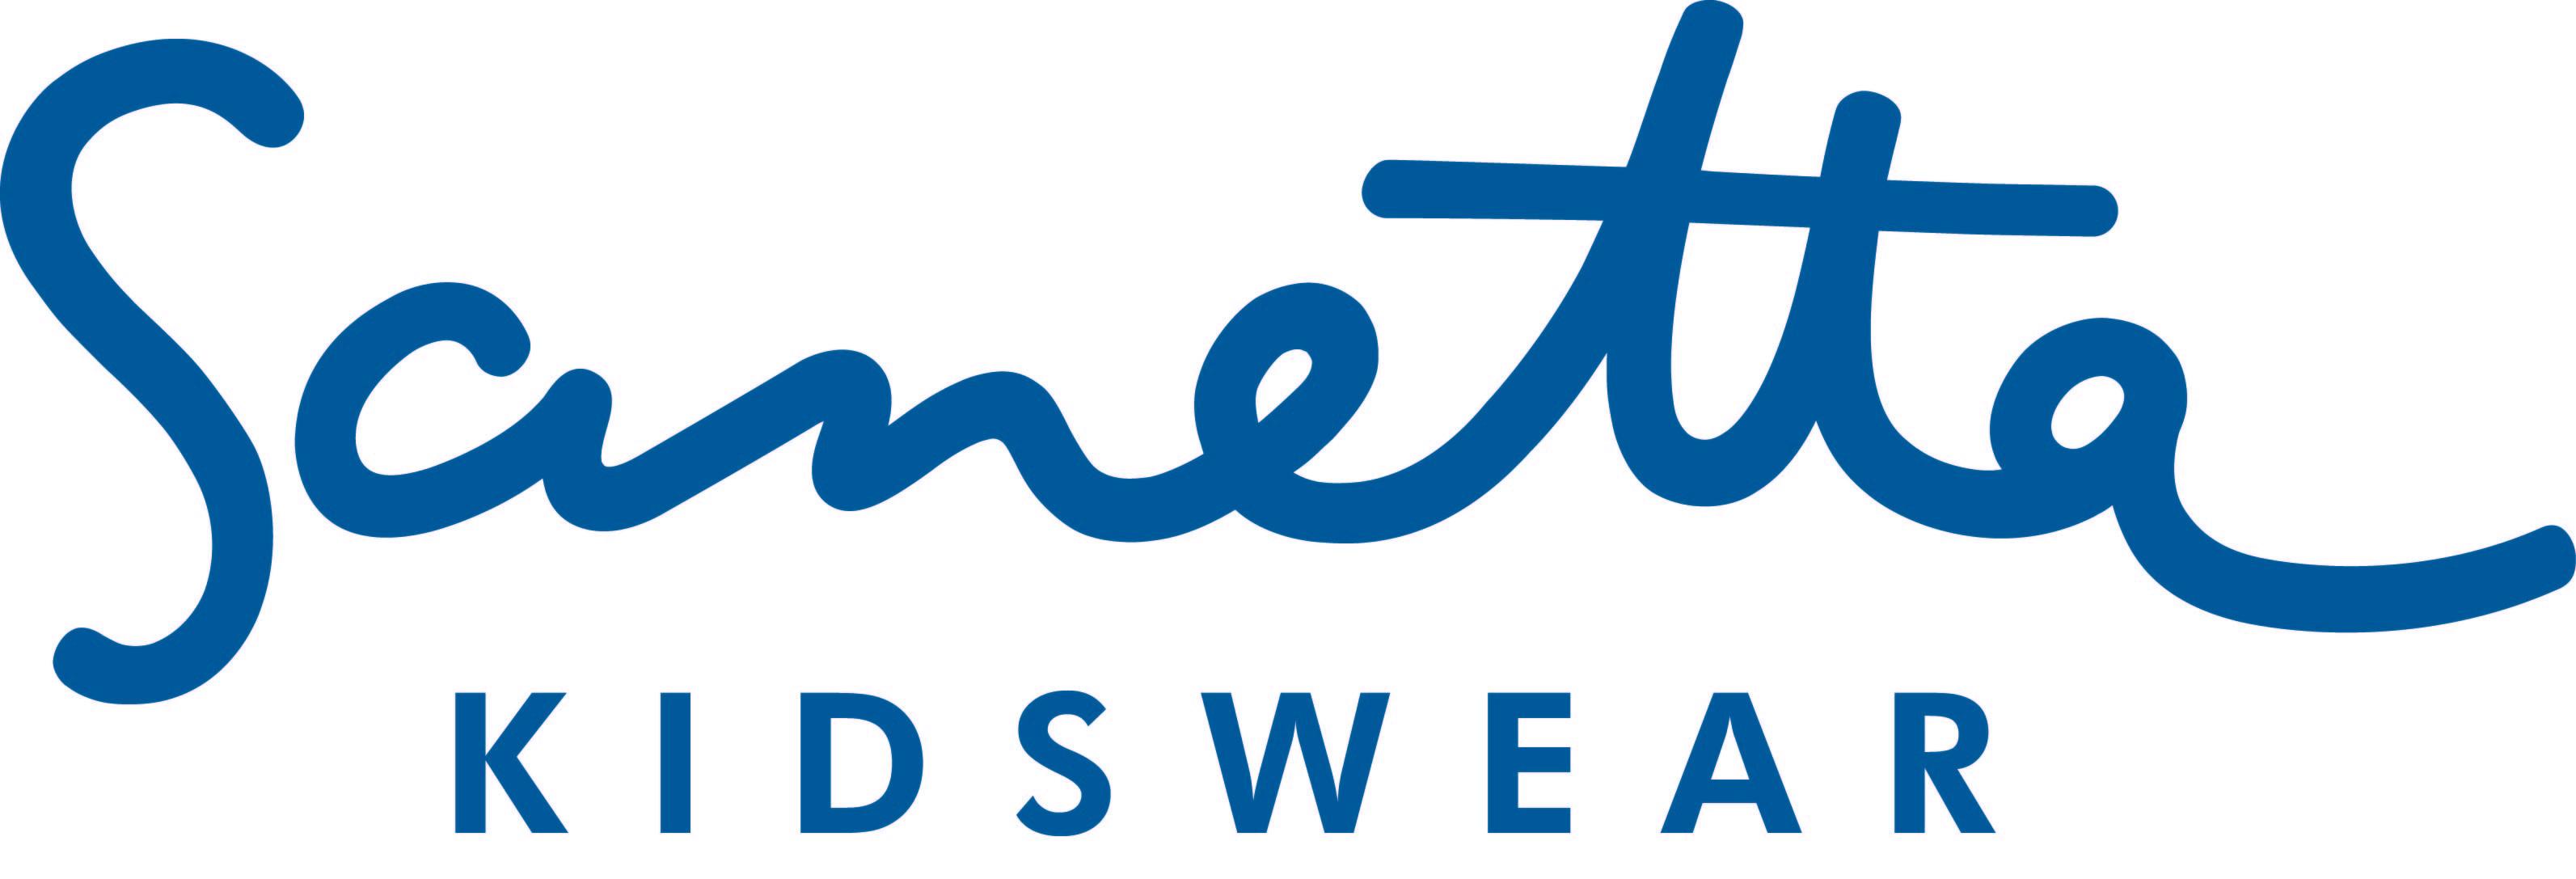 Sanetta Kidswear